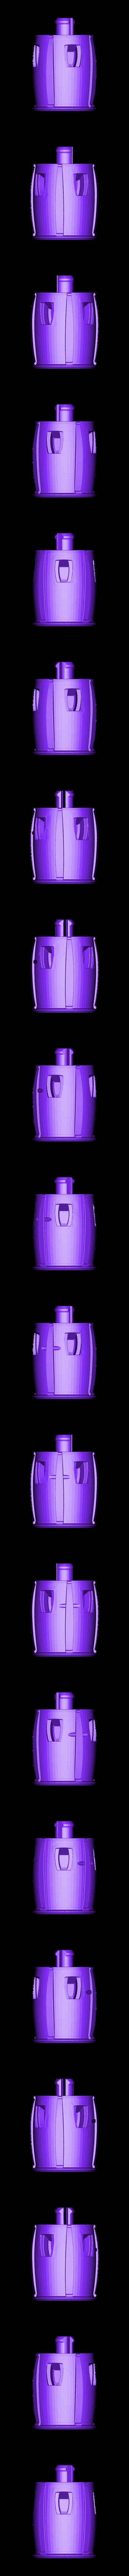 StarWalker_middle2.obj Download free OBJ file The StarWalker • 3D print design, AlbertThePrintingMachine